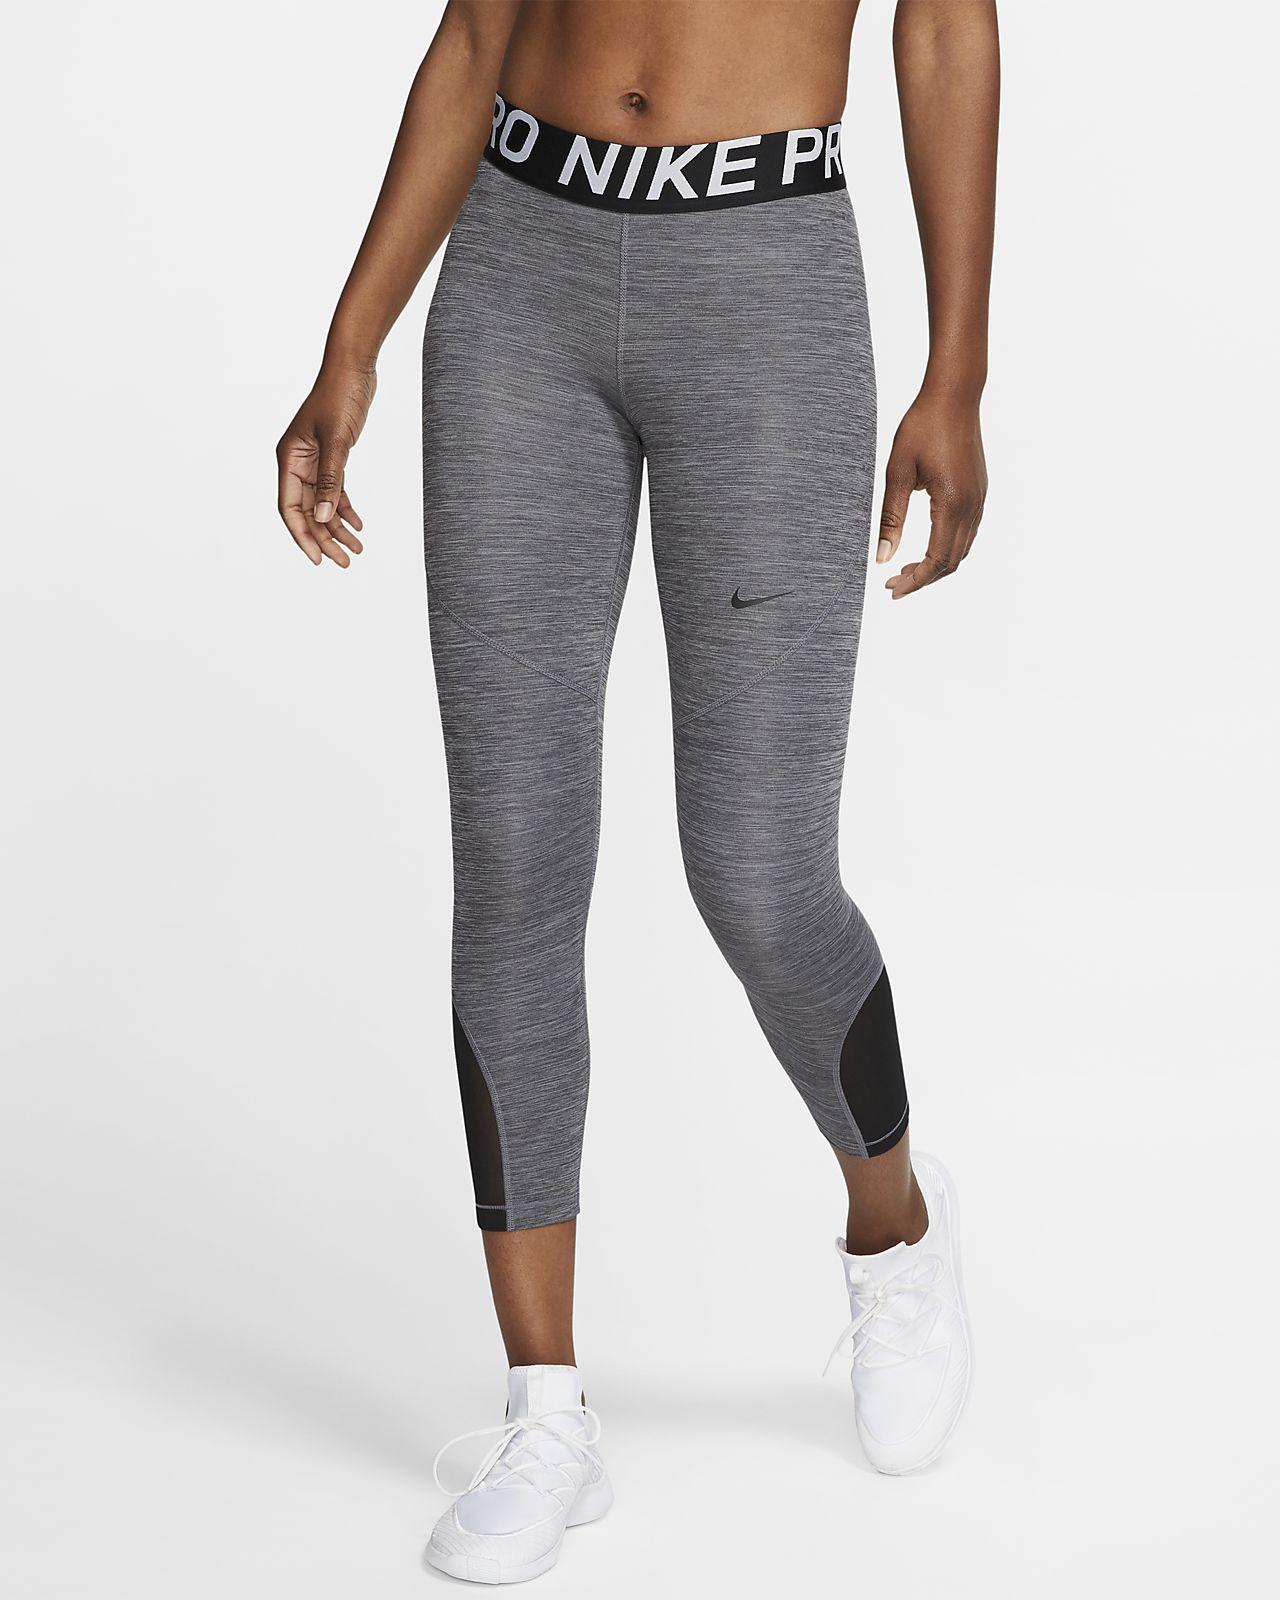 nike pro pants womens